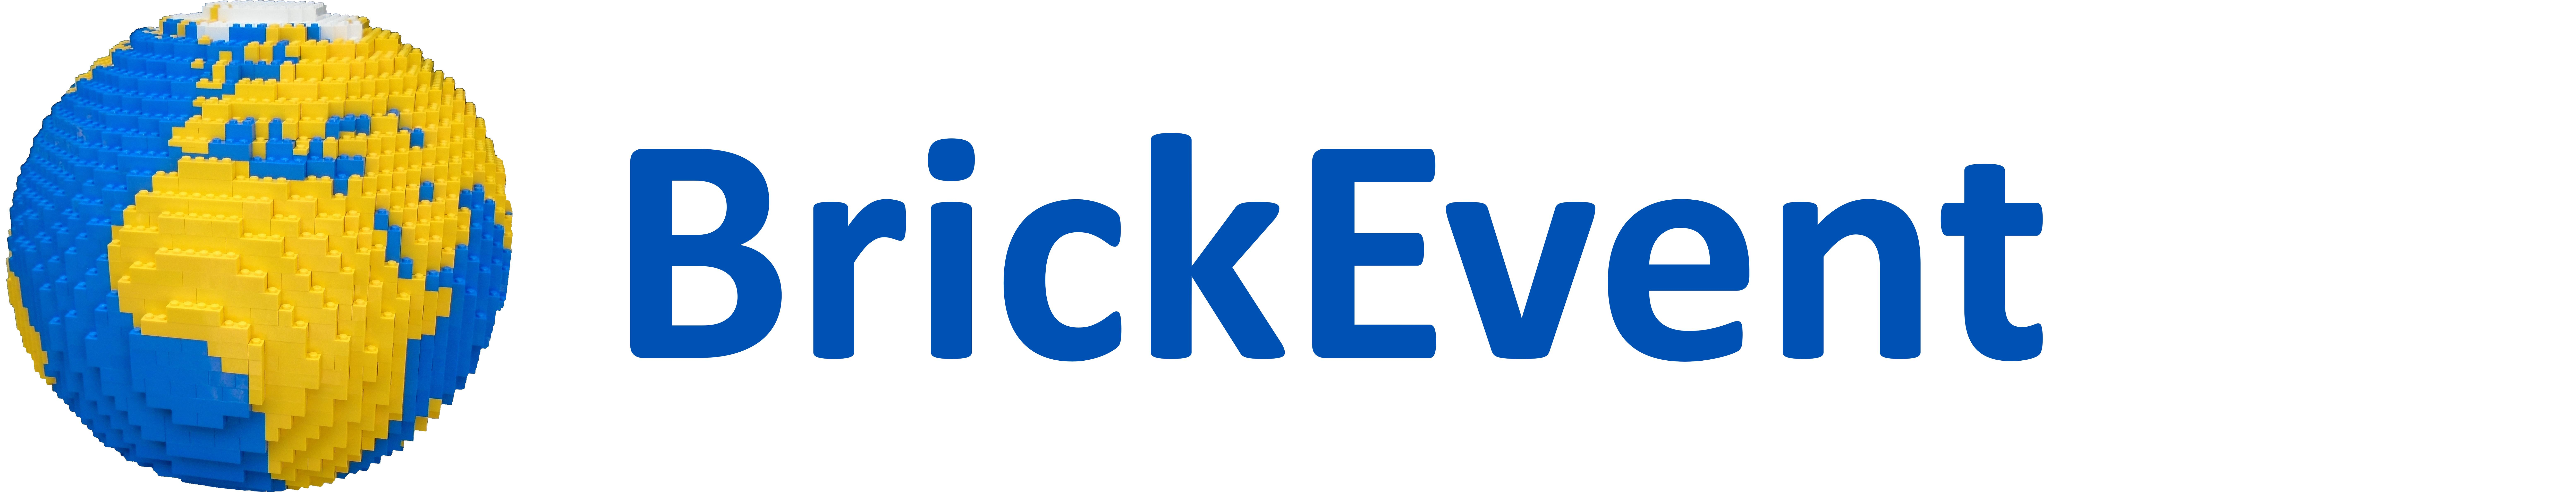 BRICKEVENT